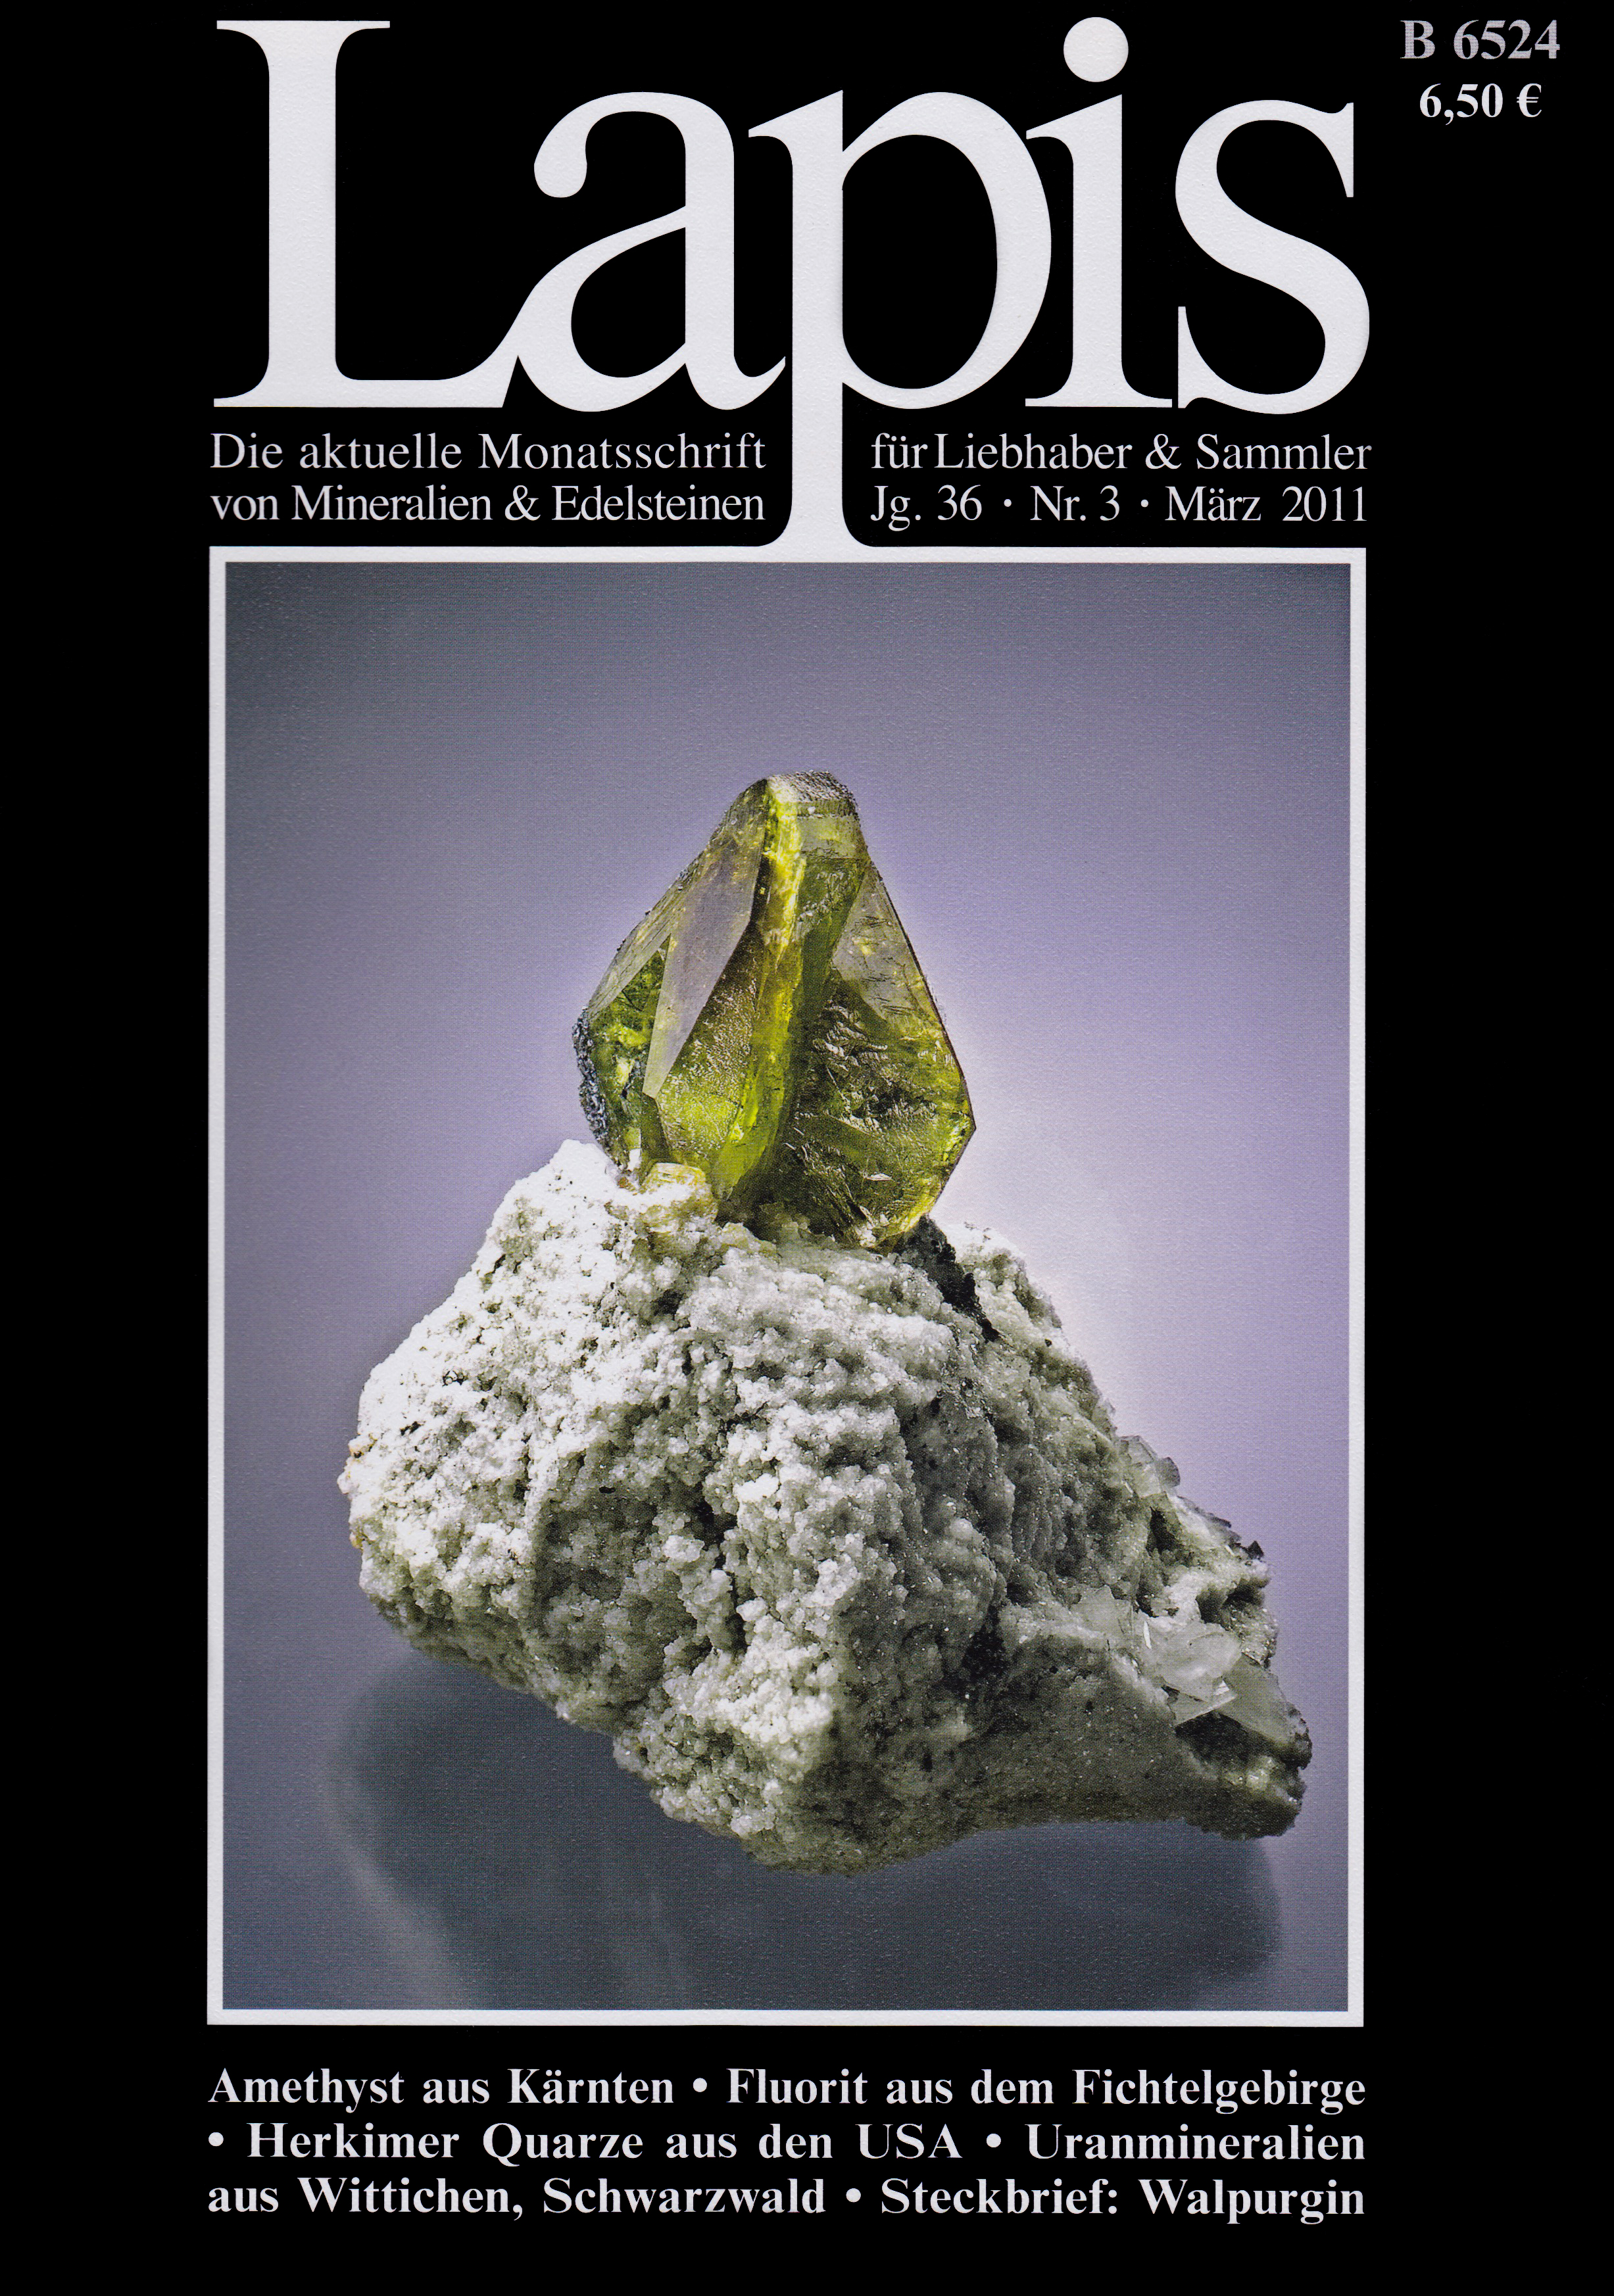 Austrian titanites quite rare aesthetic cyclic twinned crystal 2 5 cm